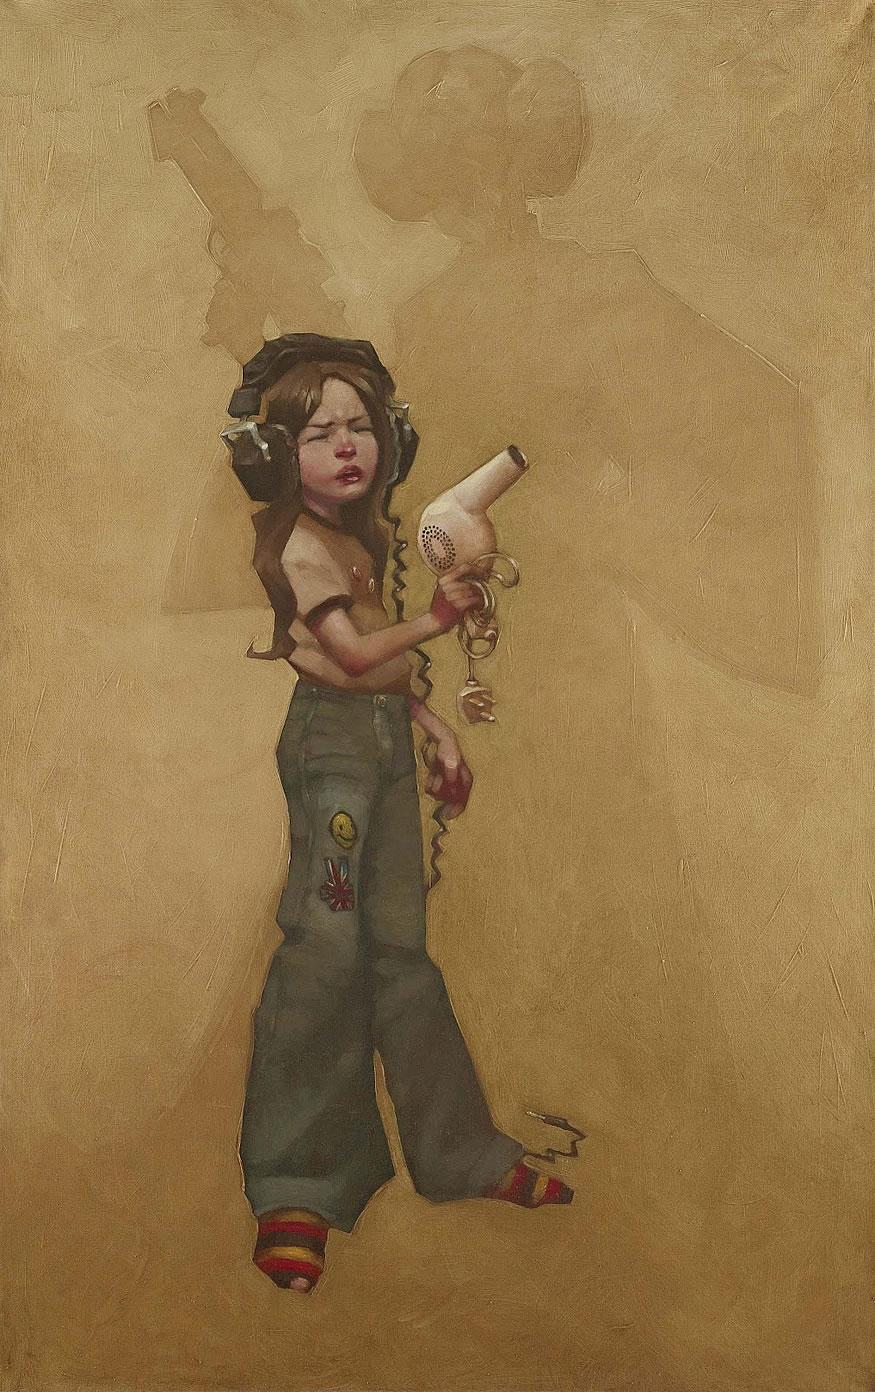 Craig-Davison-illustration-10-2